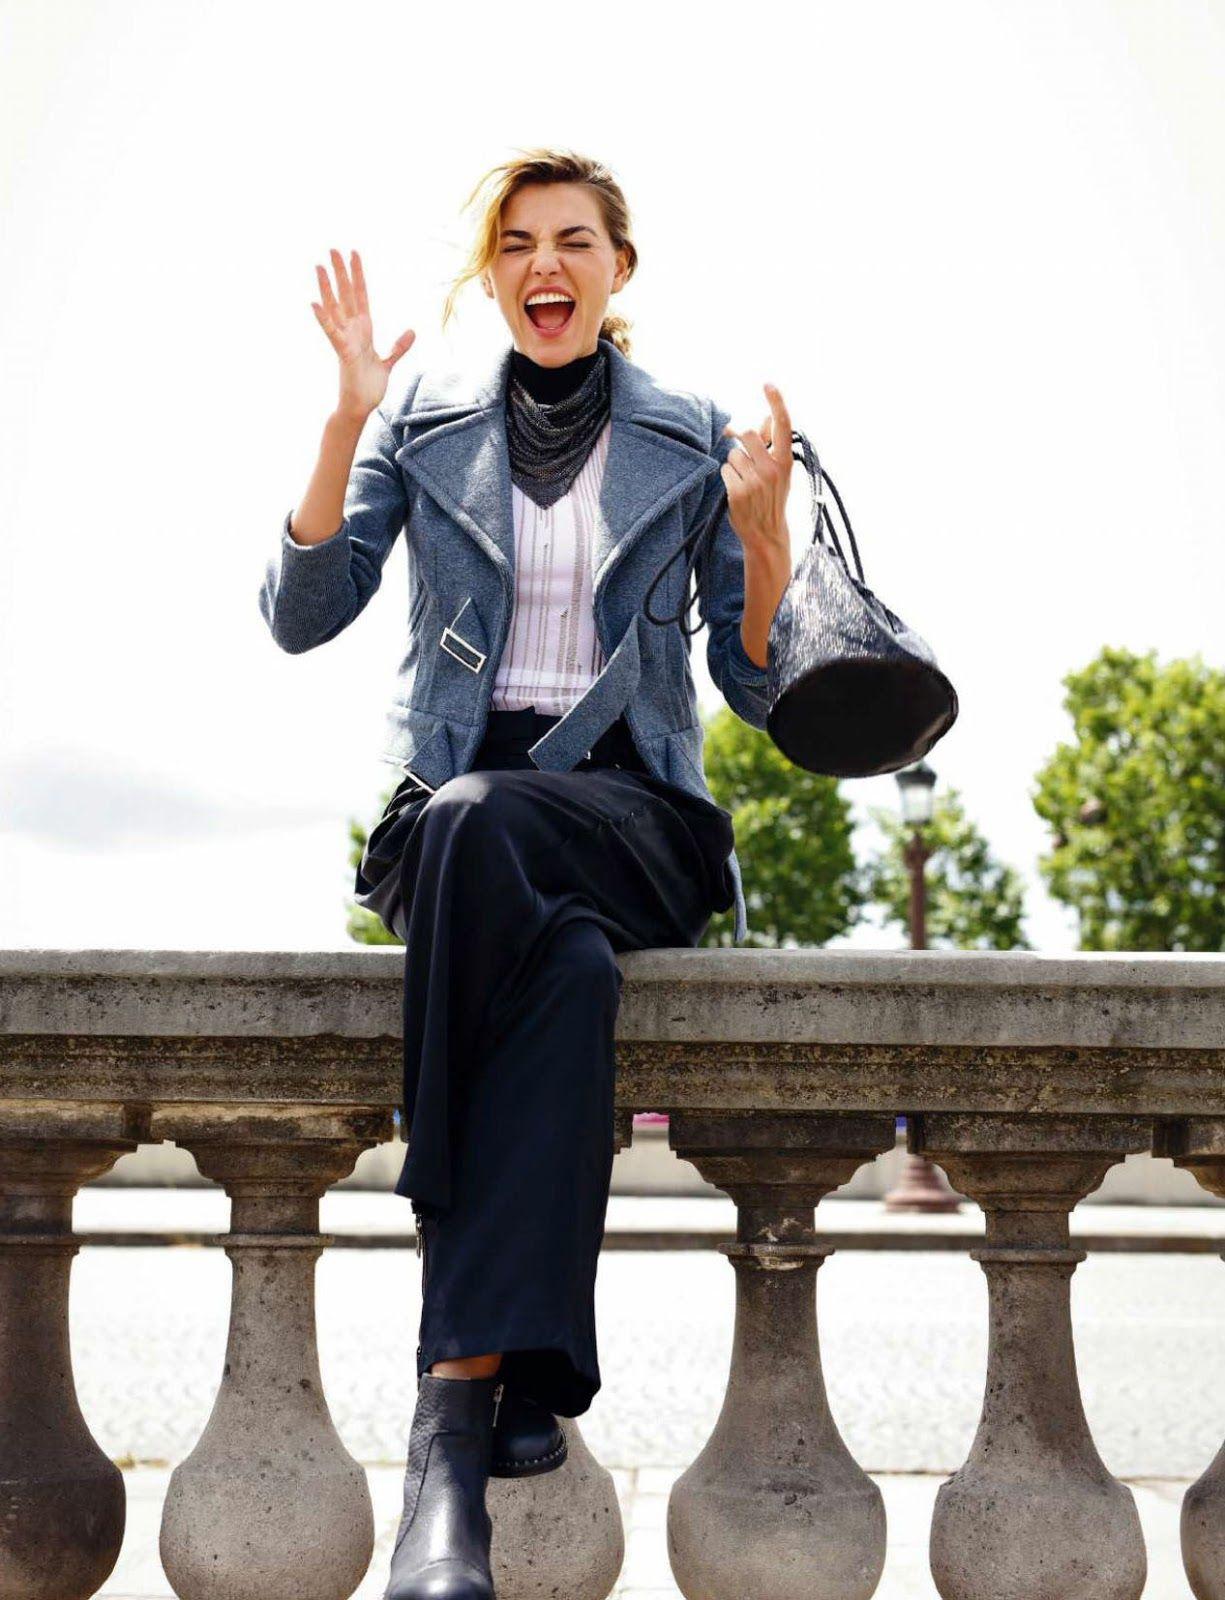 Alina Baikova by Riccardo Tinelli for Elle Spain September 2016